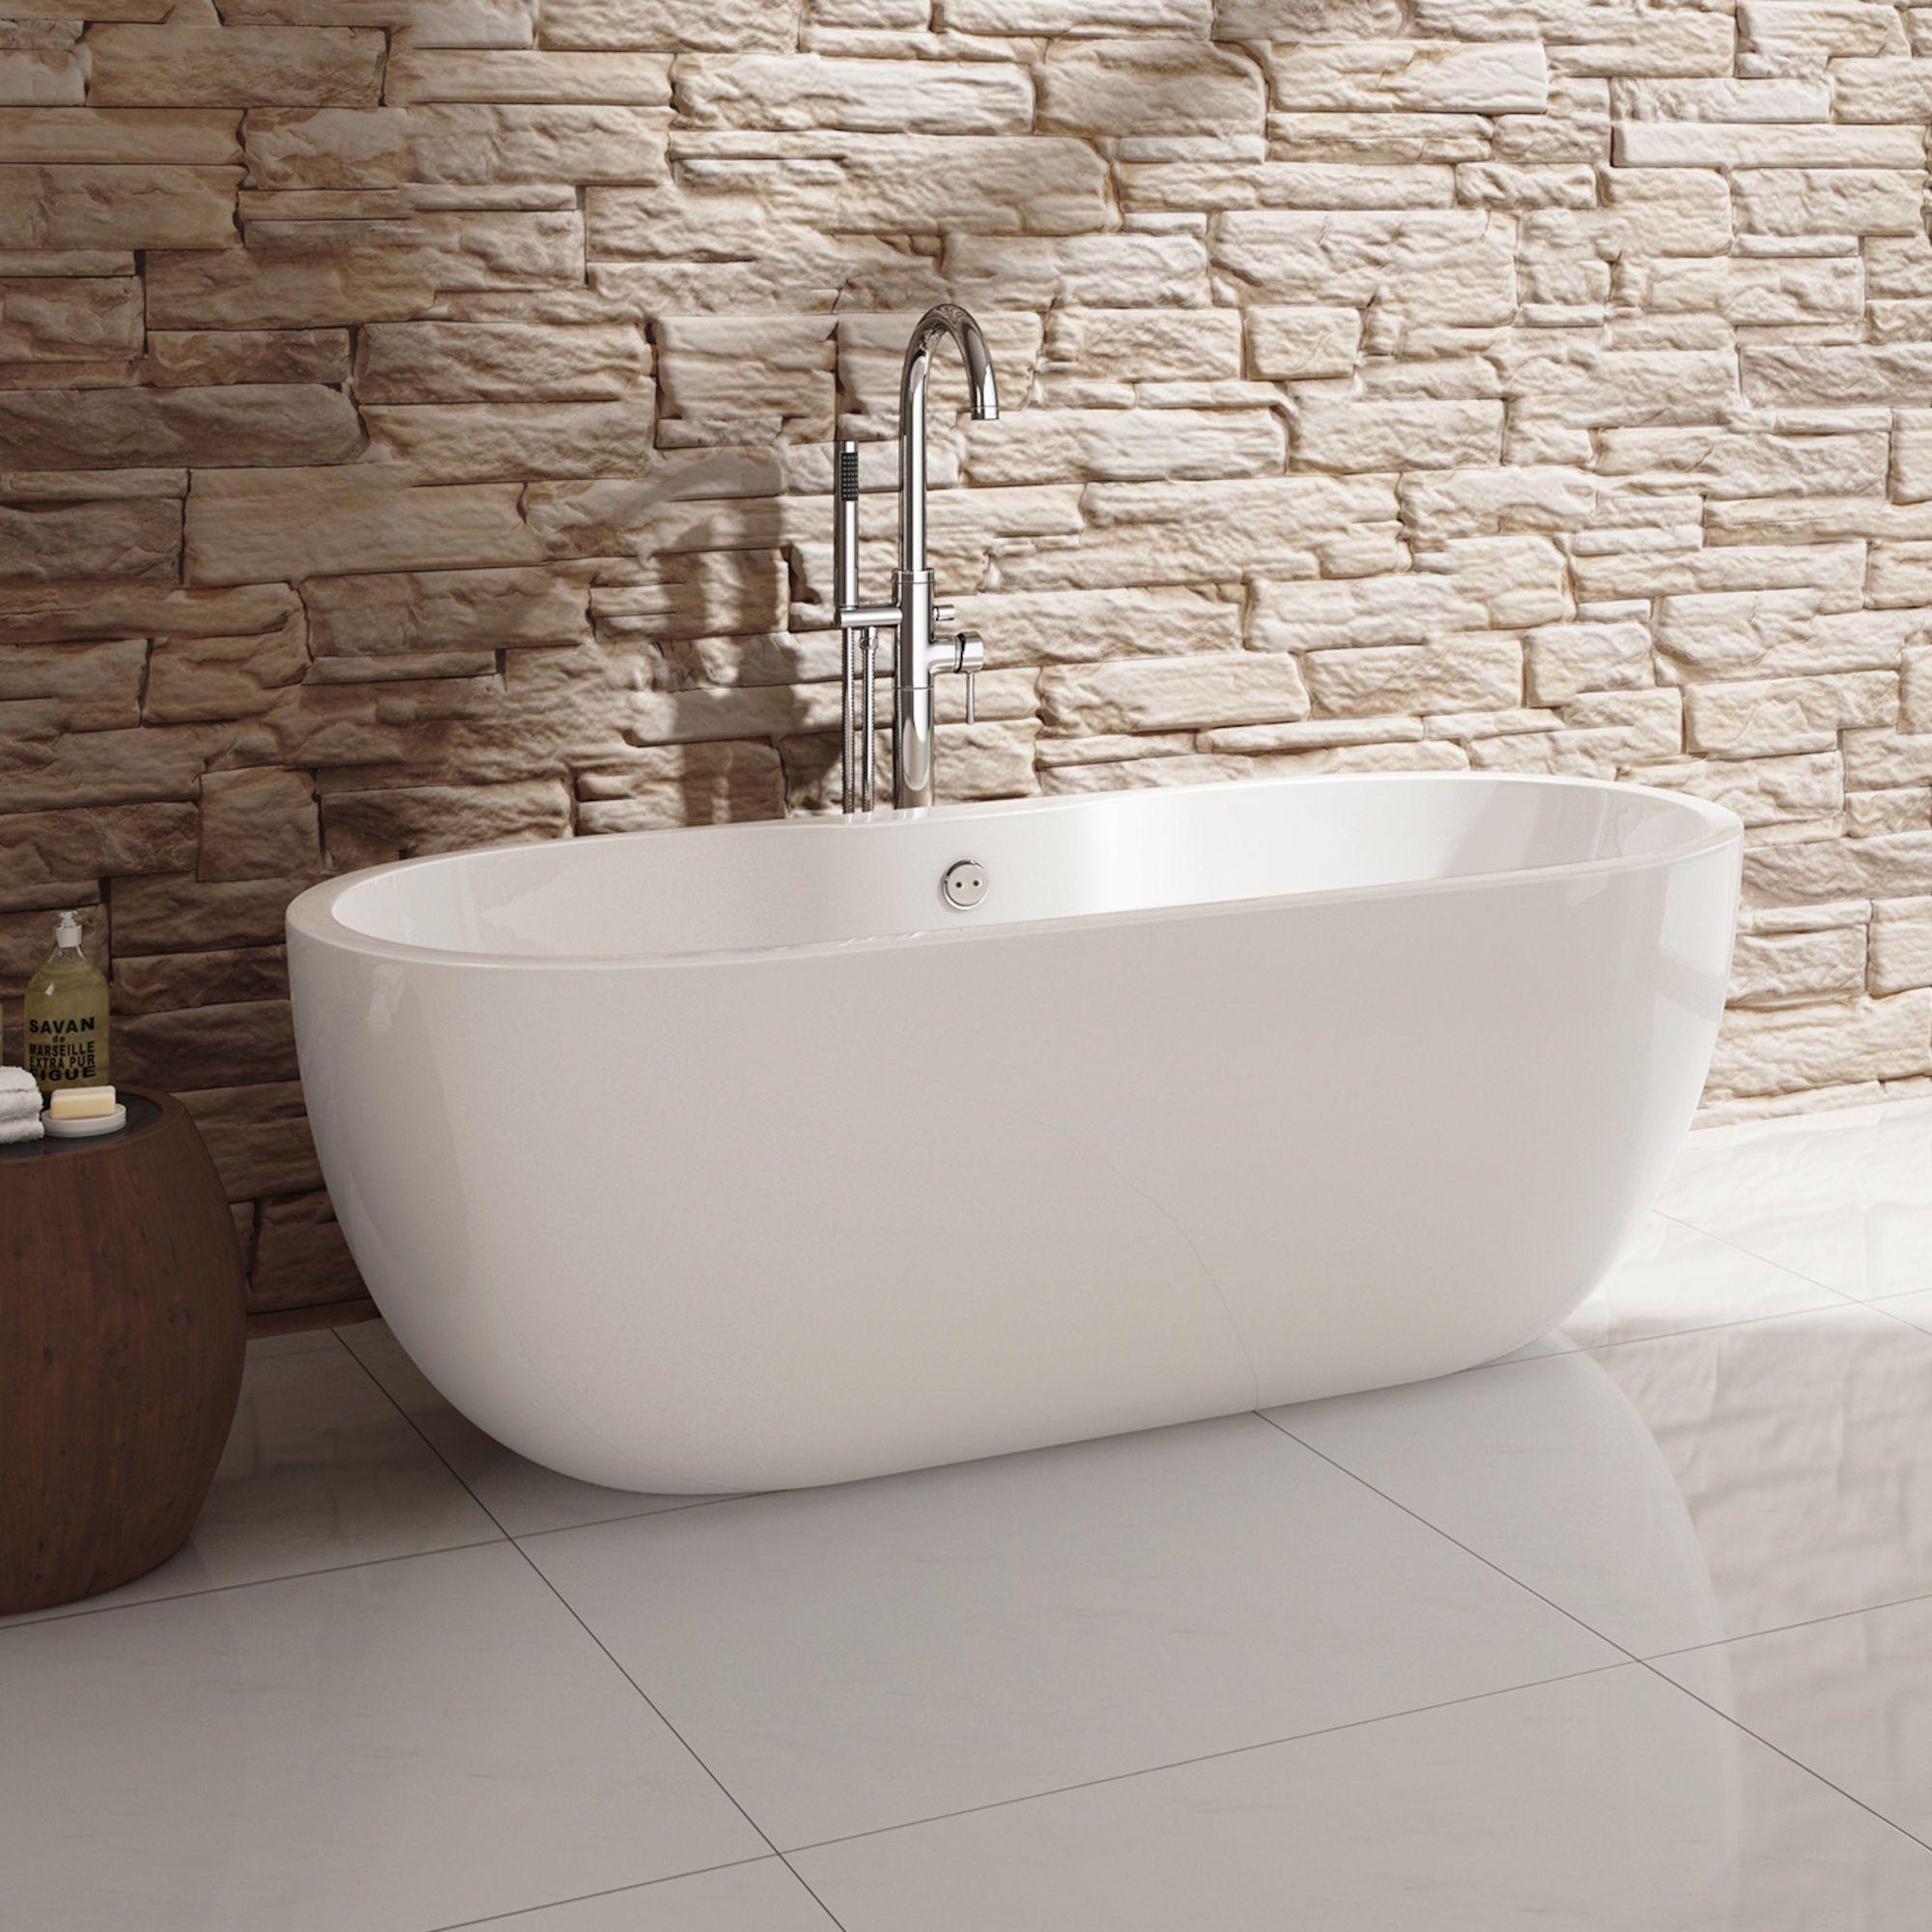 1555mmx745mm Melissa Freestanding Bath Modern Bathroom Design